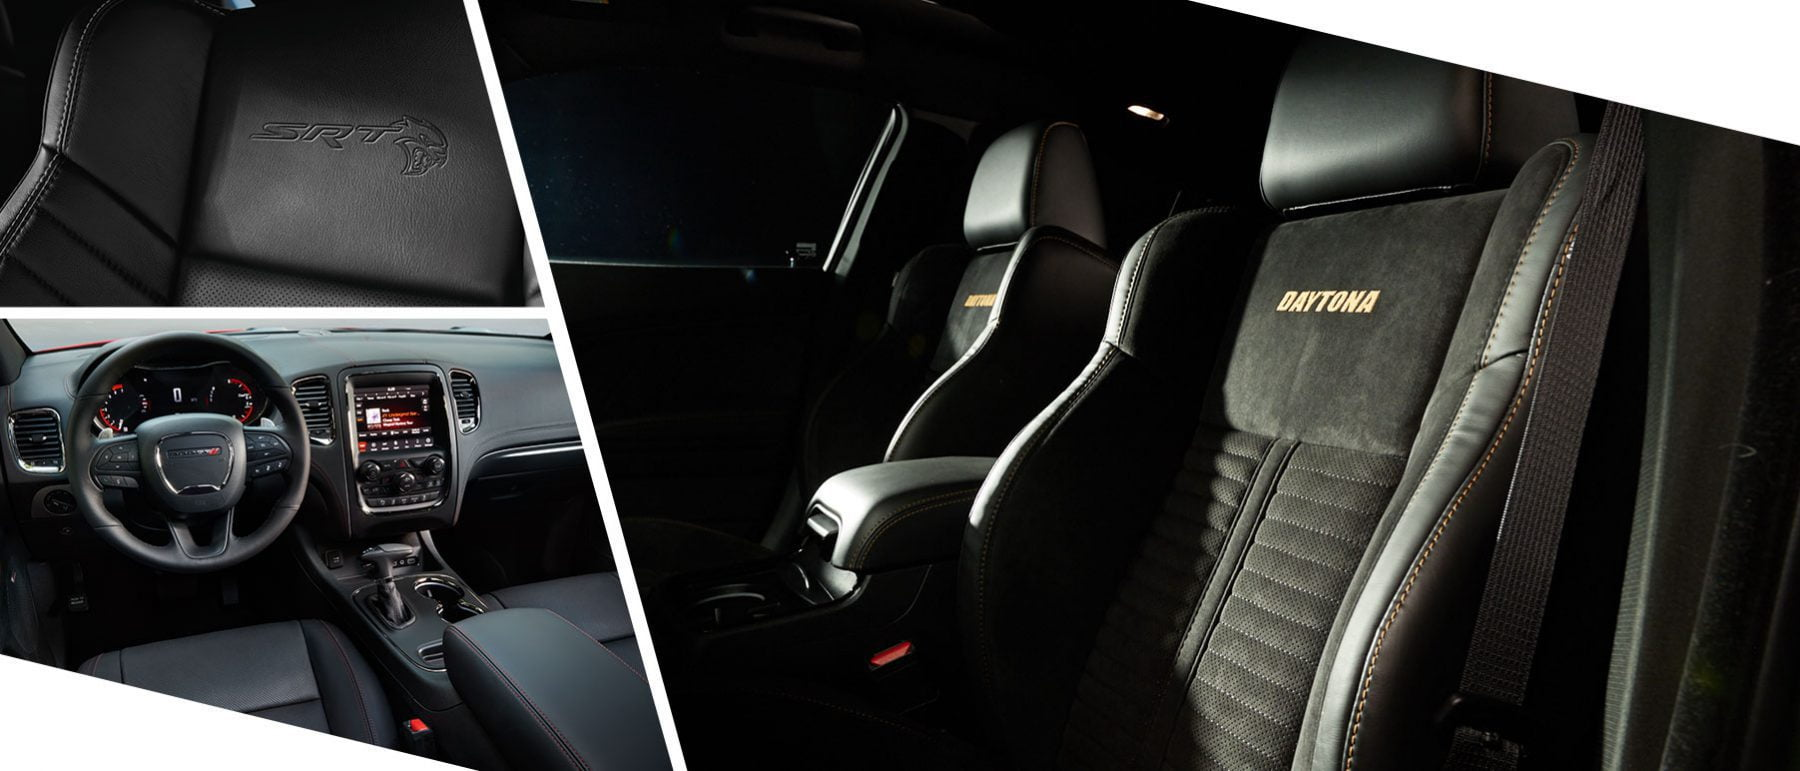 2019 dodge charger daytona and srt interior